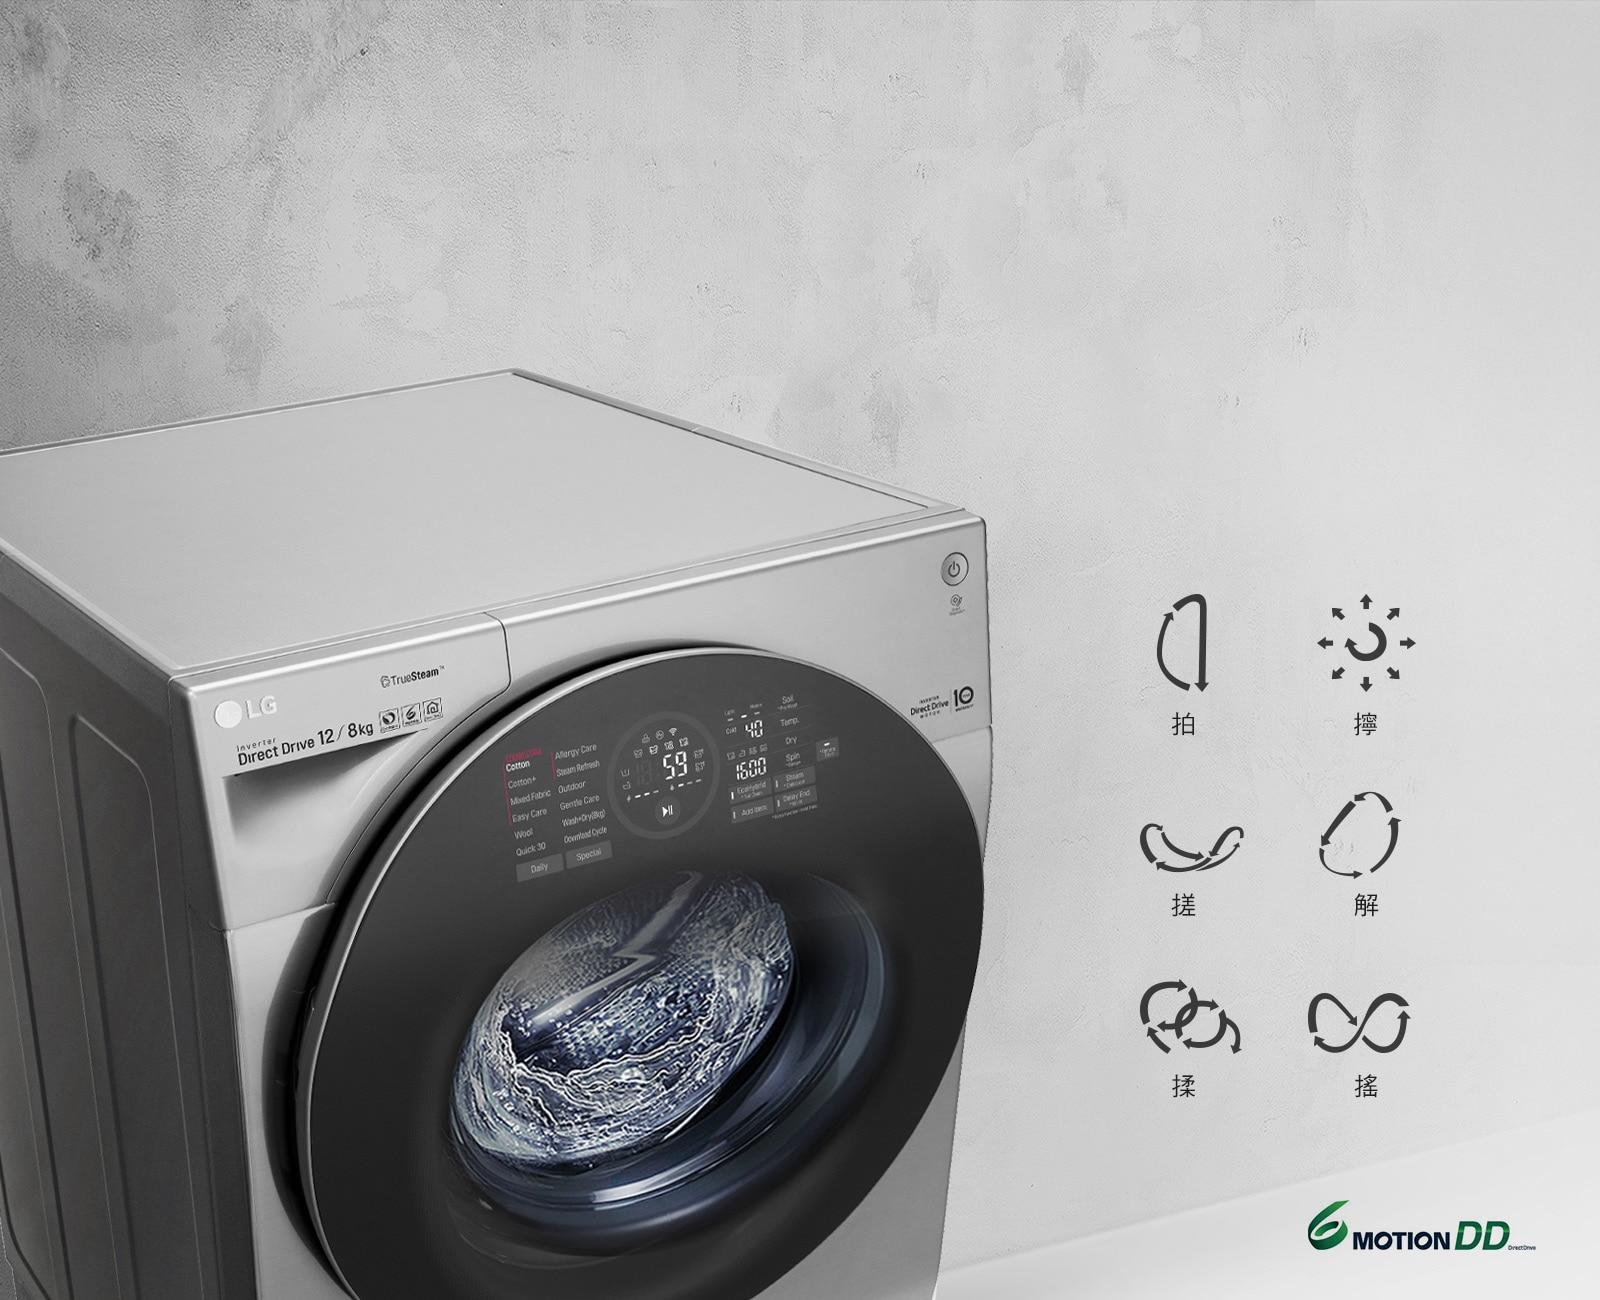 6 Motion DD模擬媽媽手洗動作<br>針對各種衣物提供最適合的洗衣行程選擇<br>1